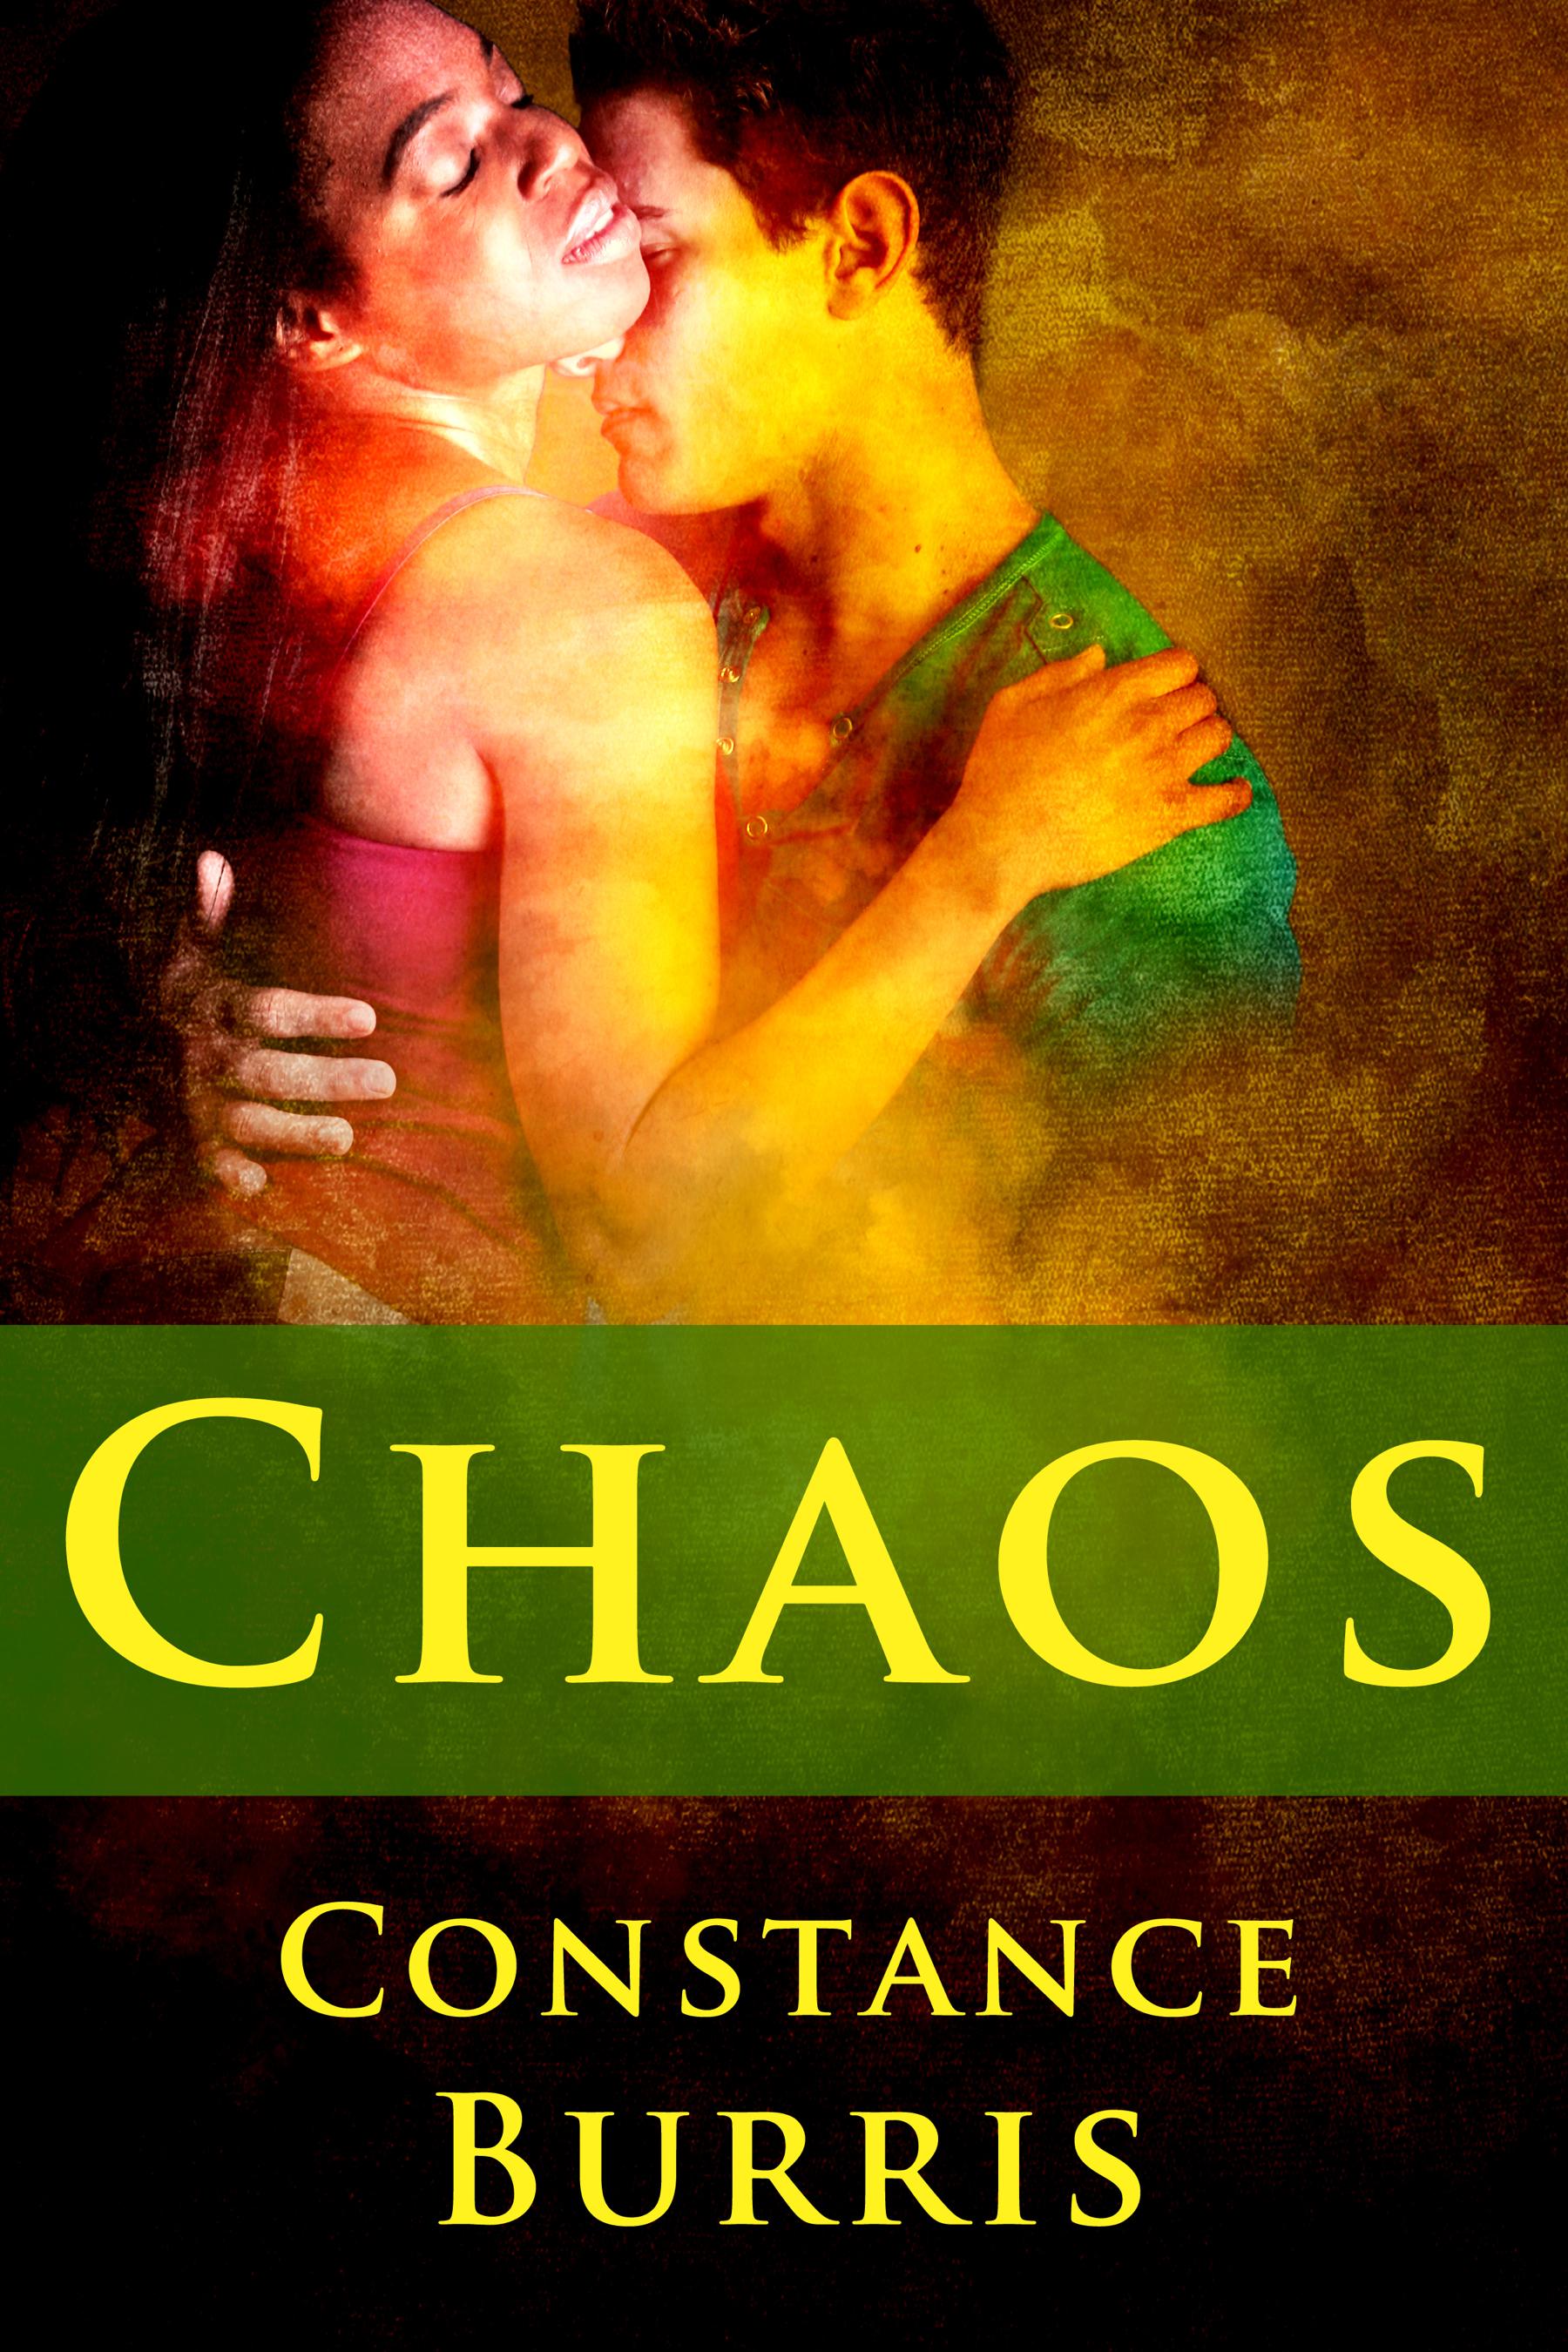 Constance Burris Allen Chaos Short Story